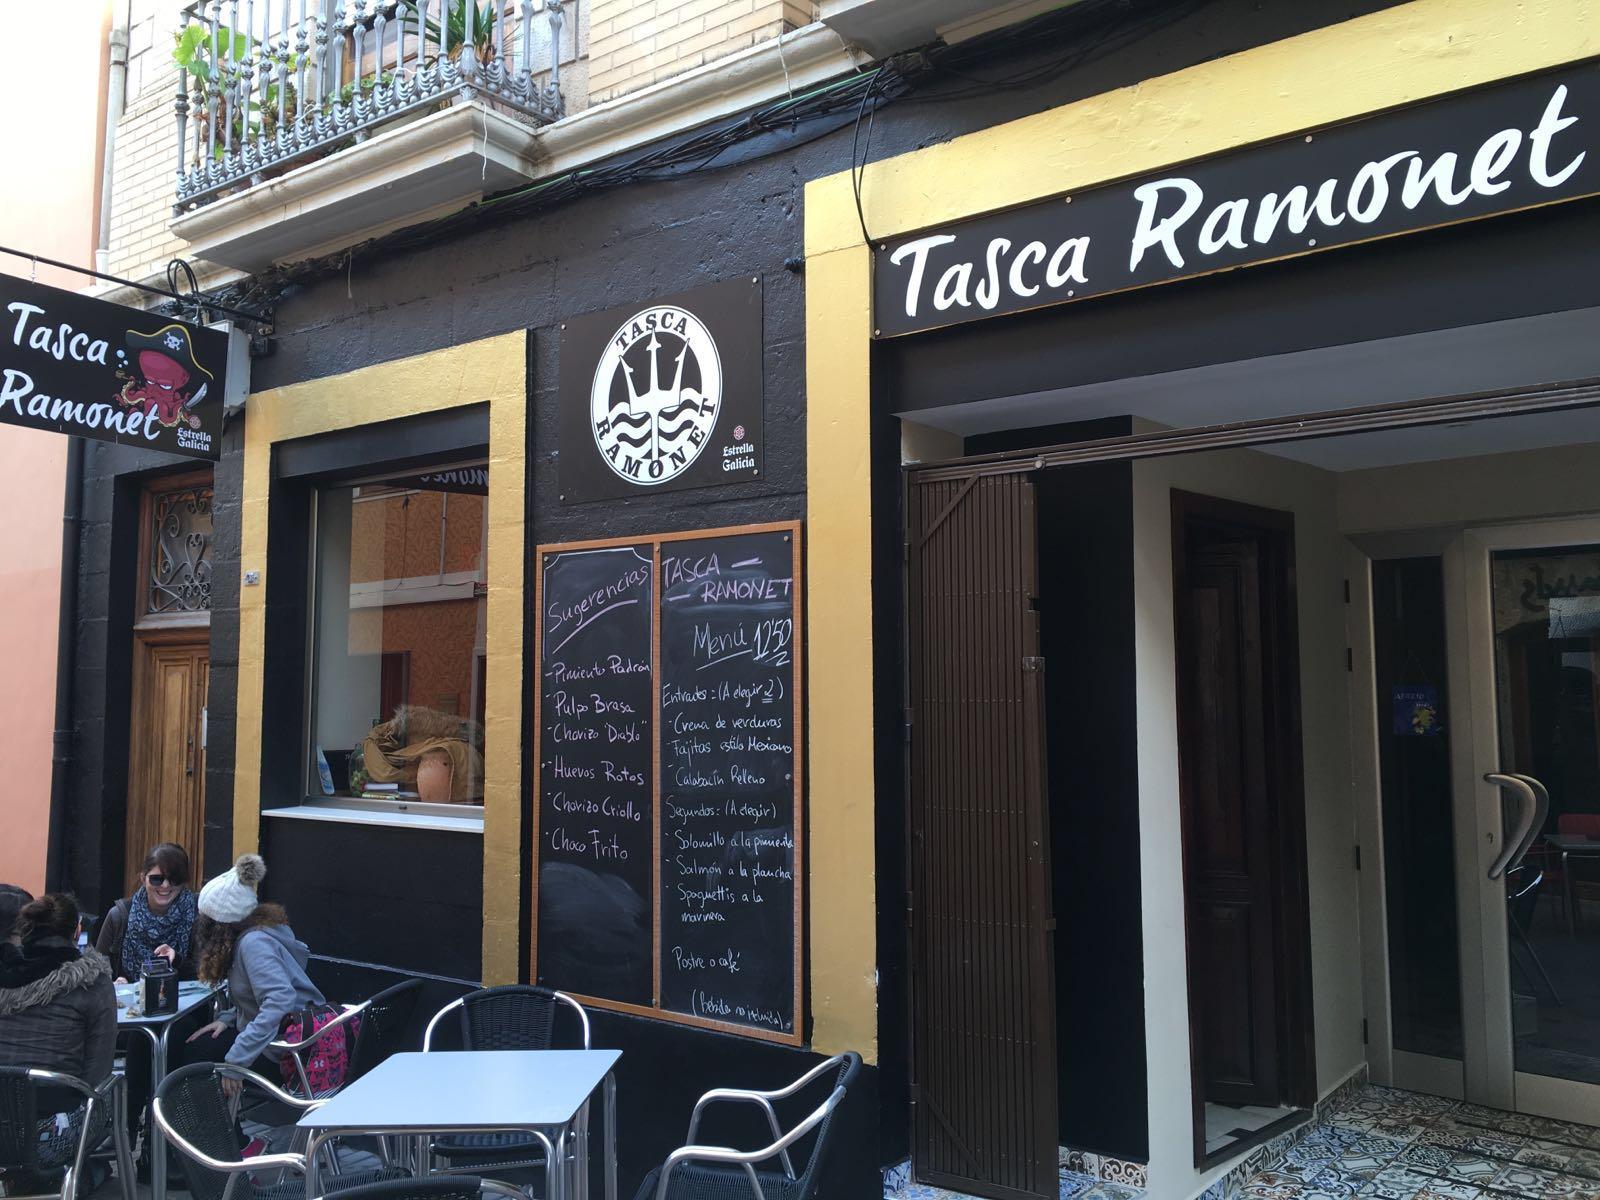 Fachada Tasca Ramonet Denia Calle Loreto